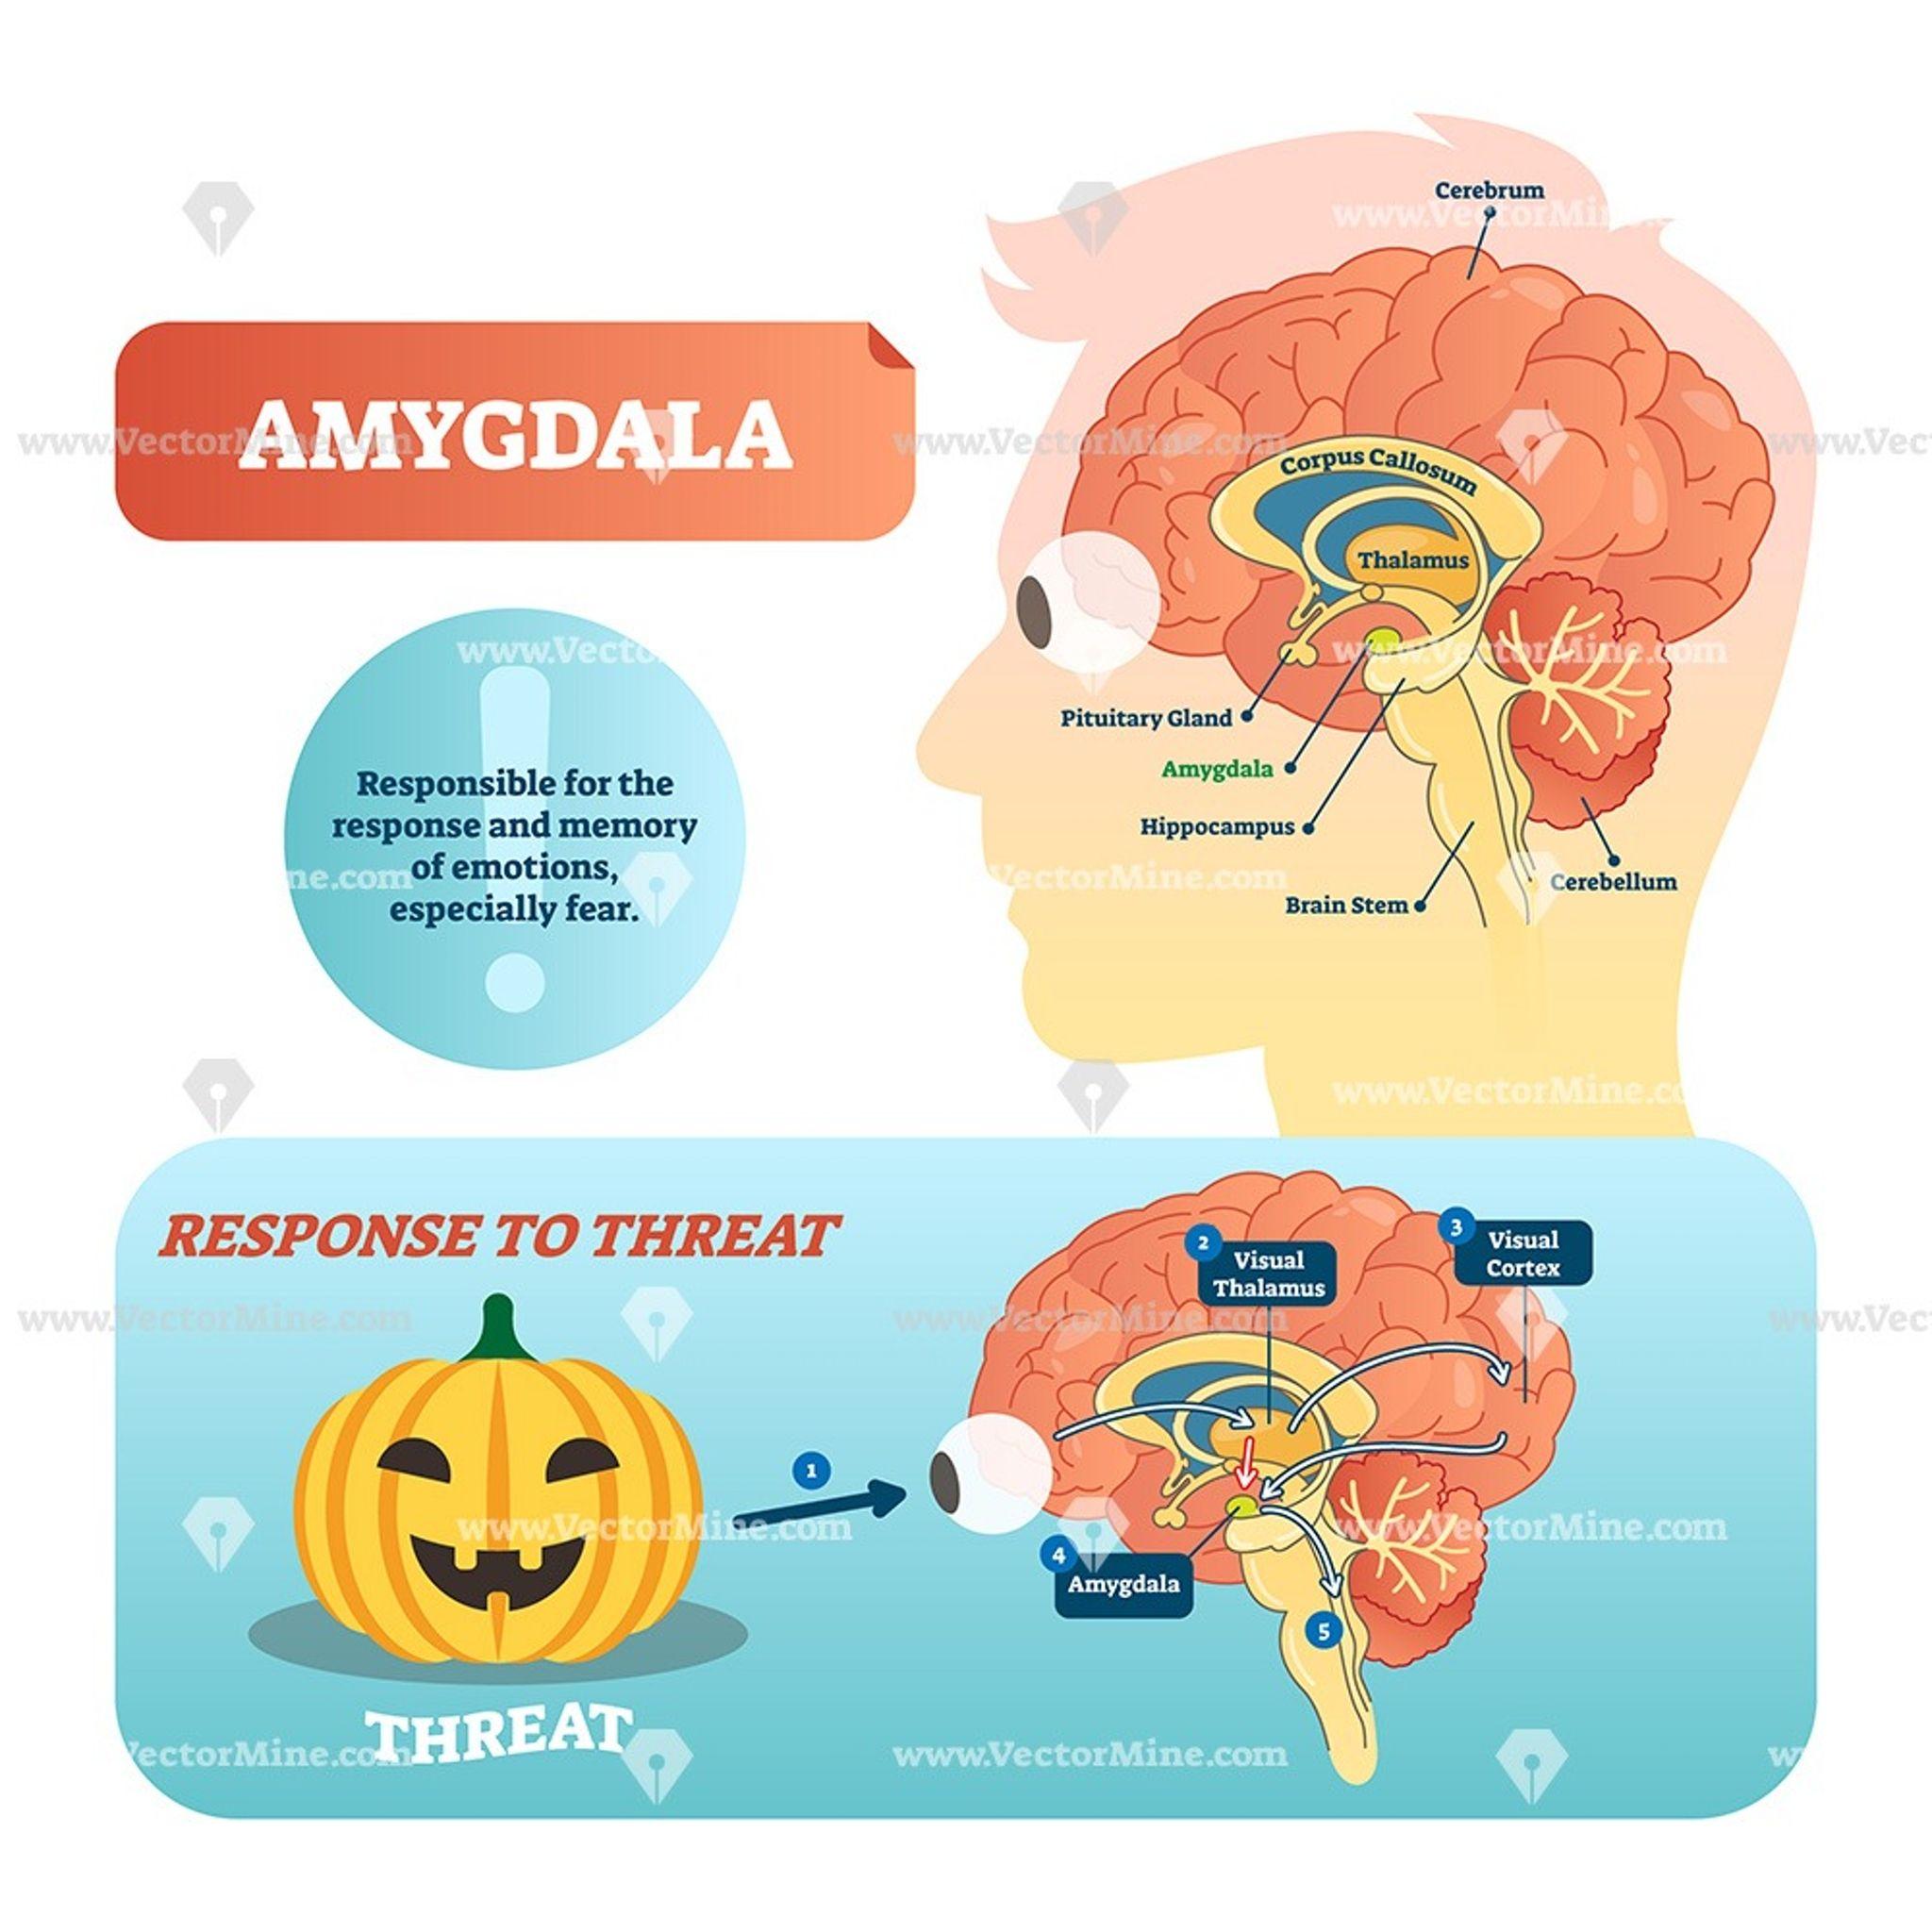 Amygdala Medical Labeled Vector Illustration Diagram